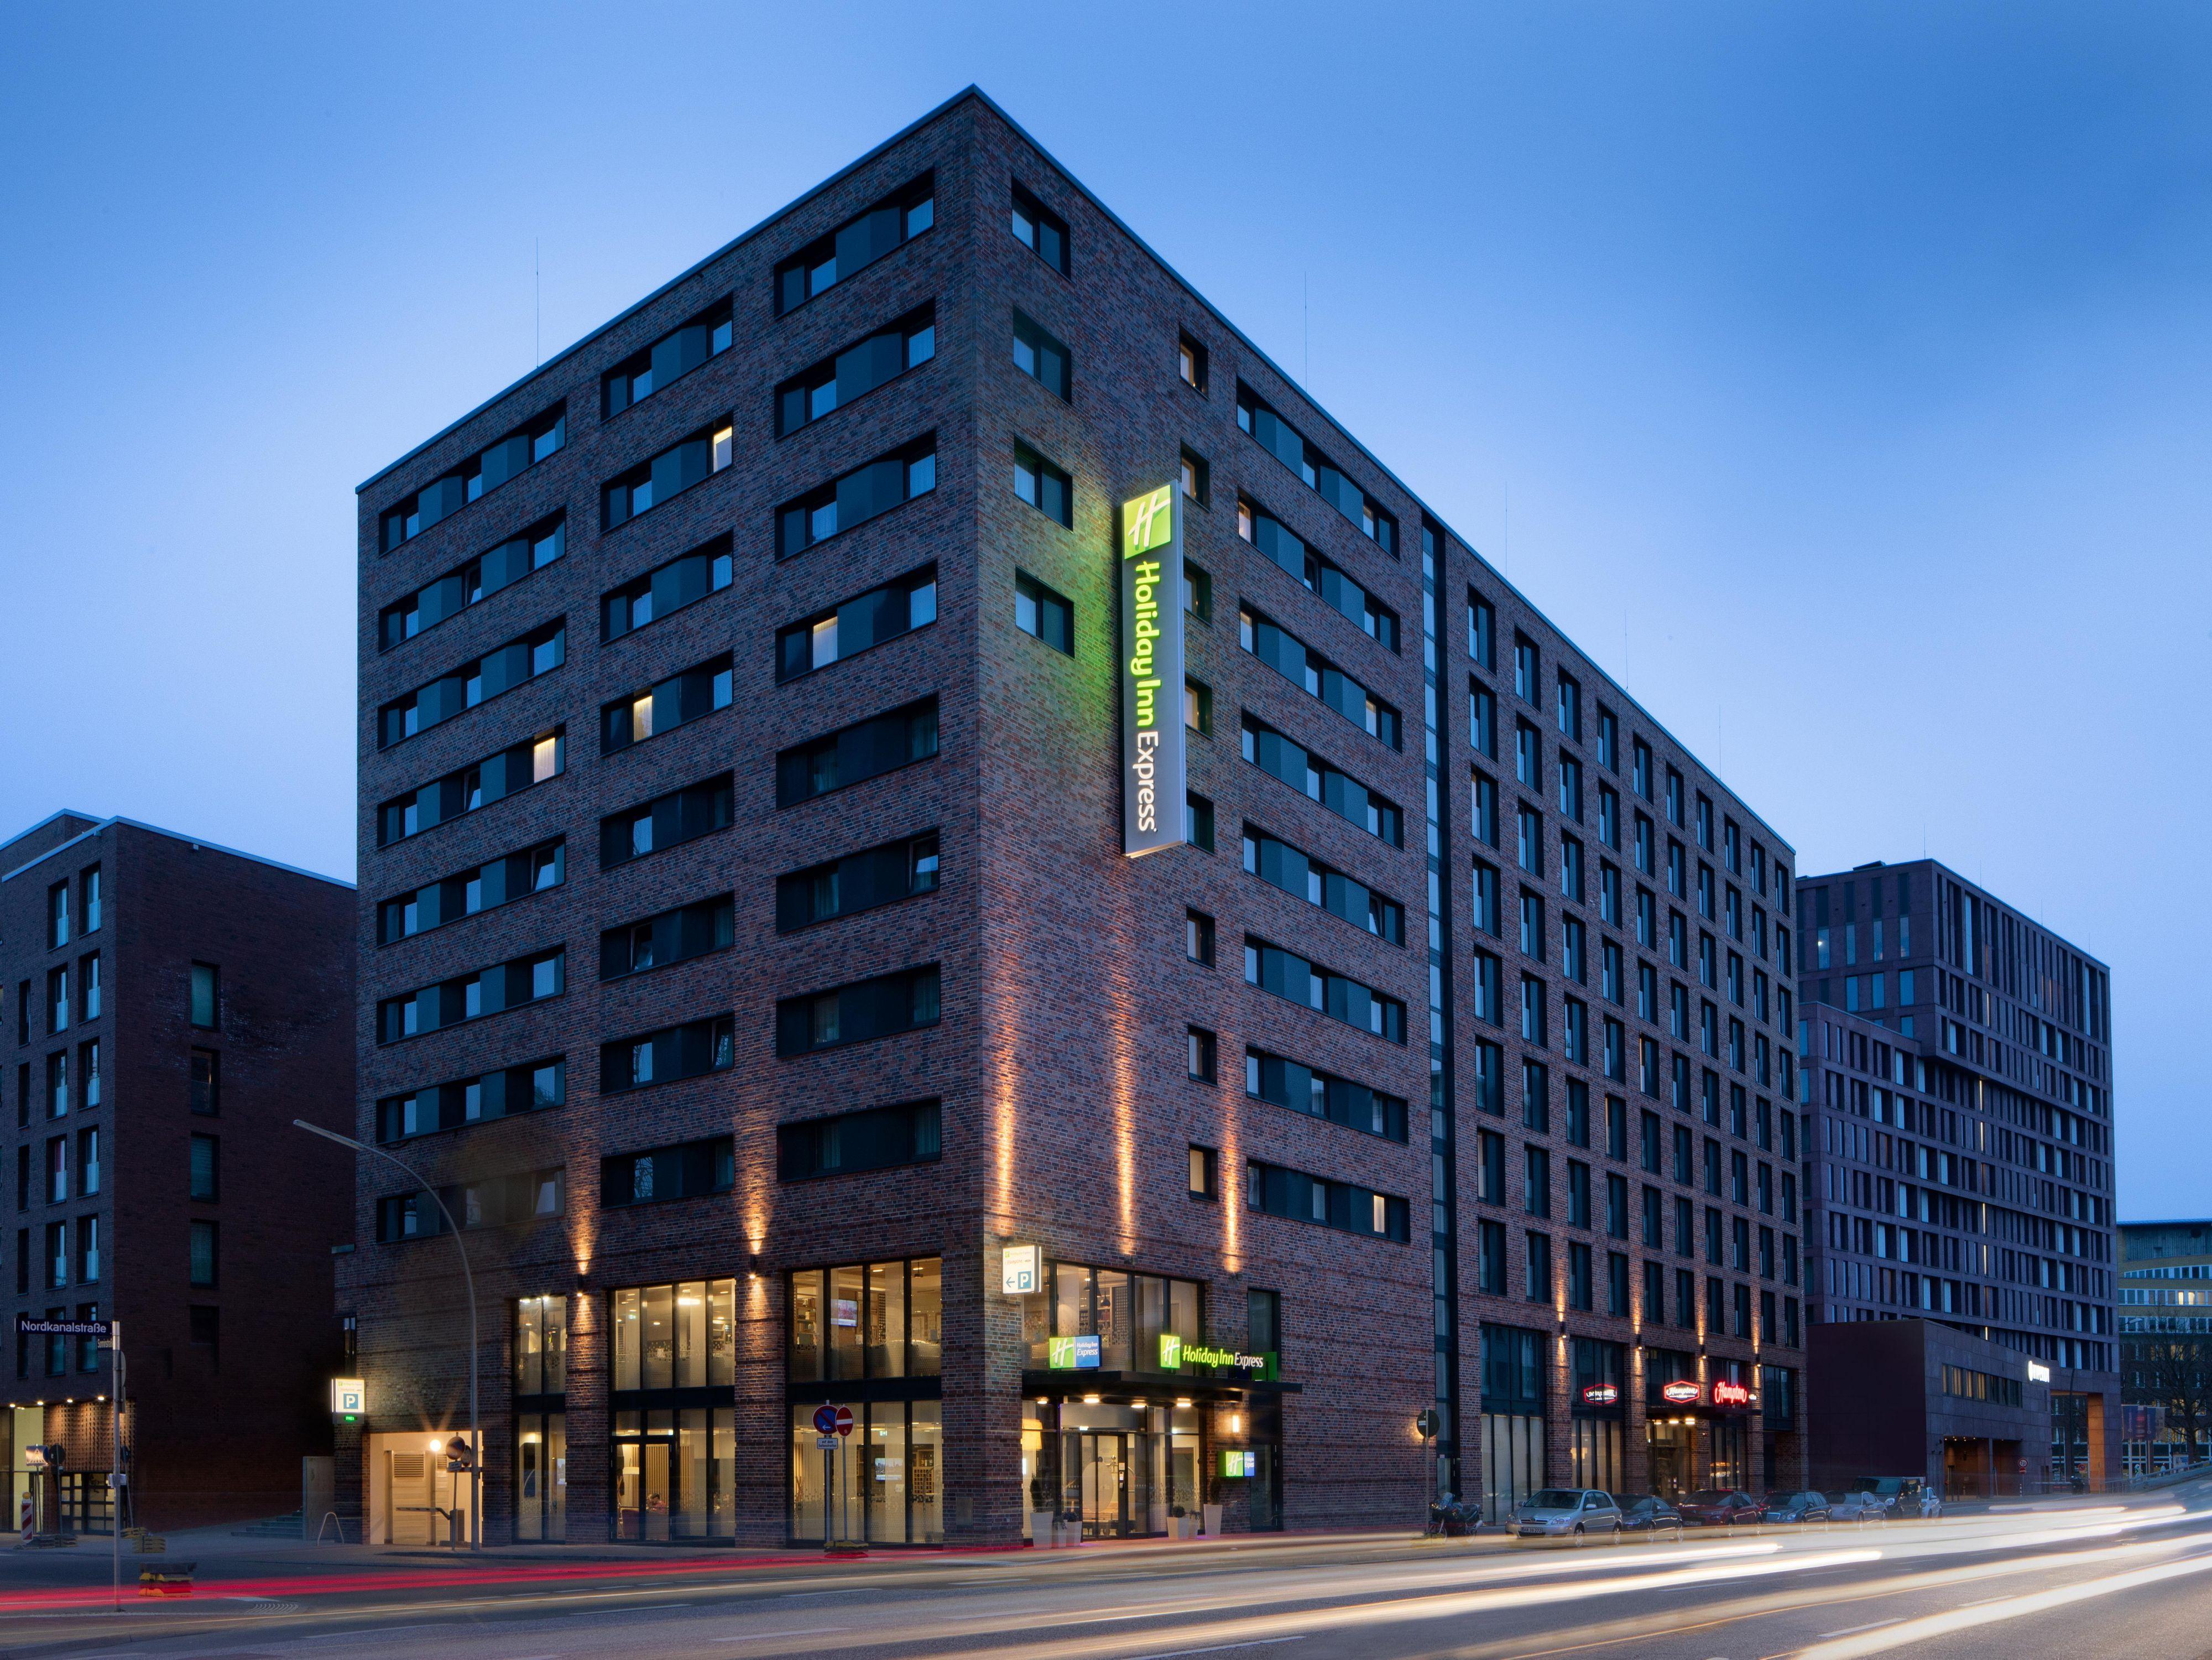 Ihg Hotels Hamburg